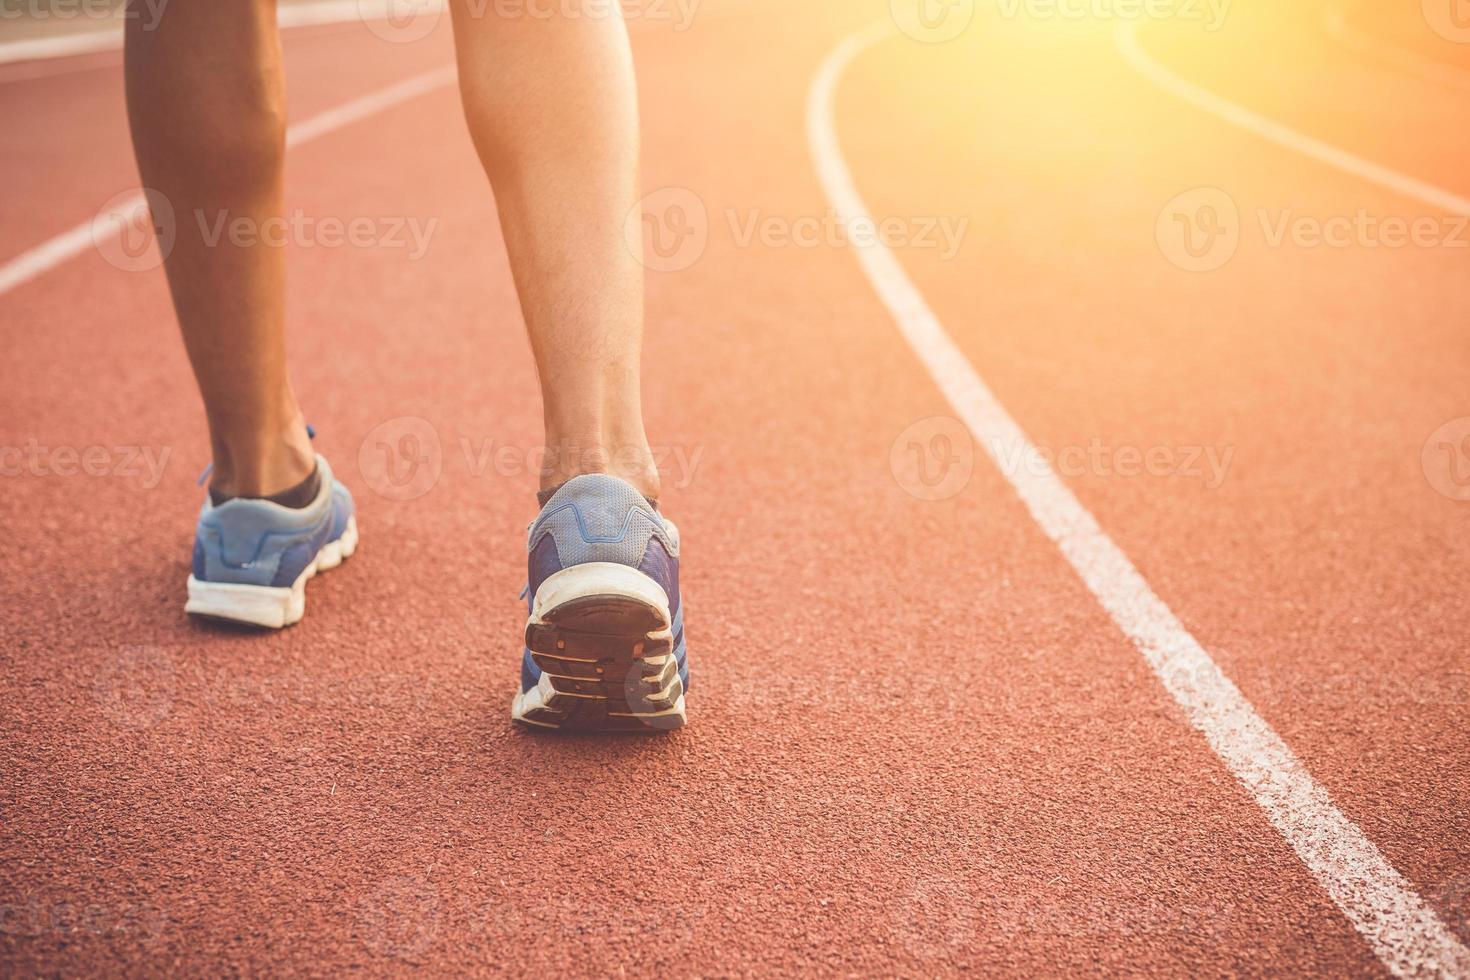 löpare fötter på springande stadion foto